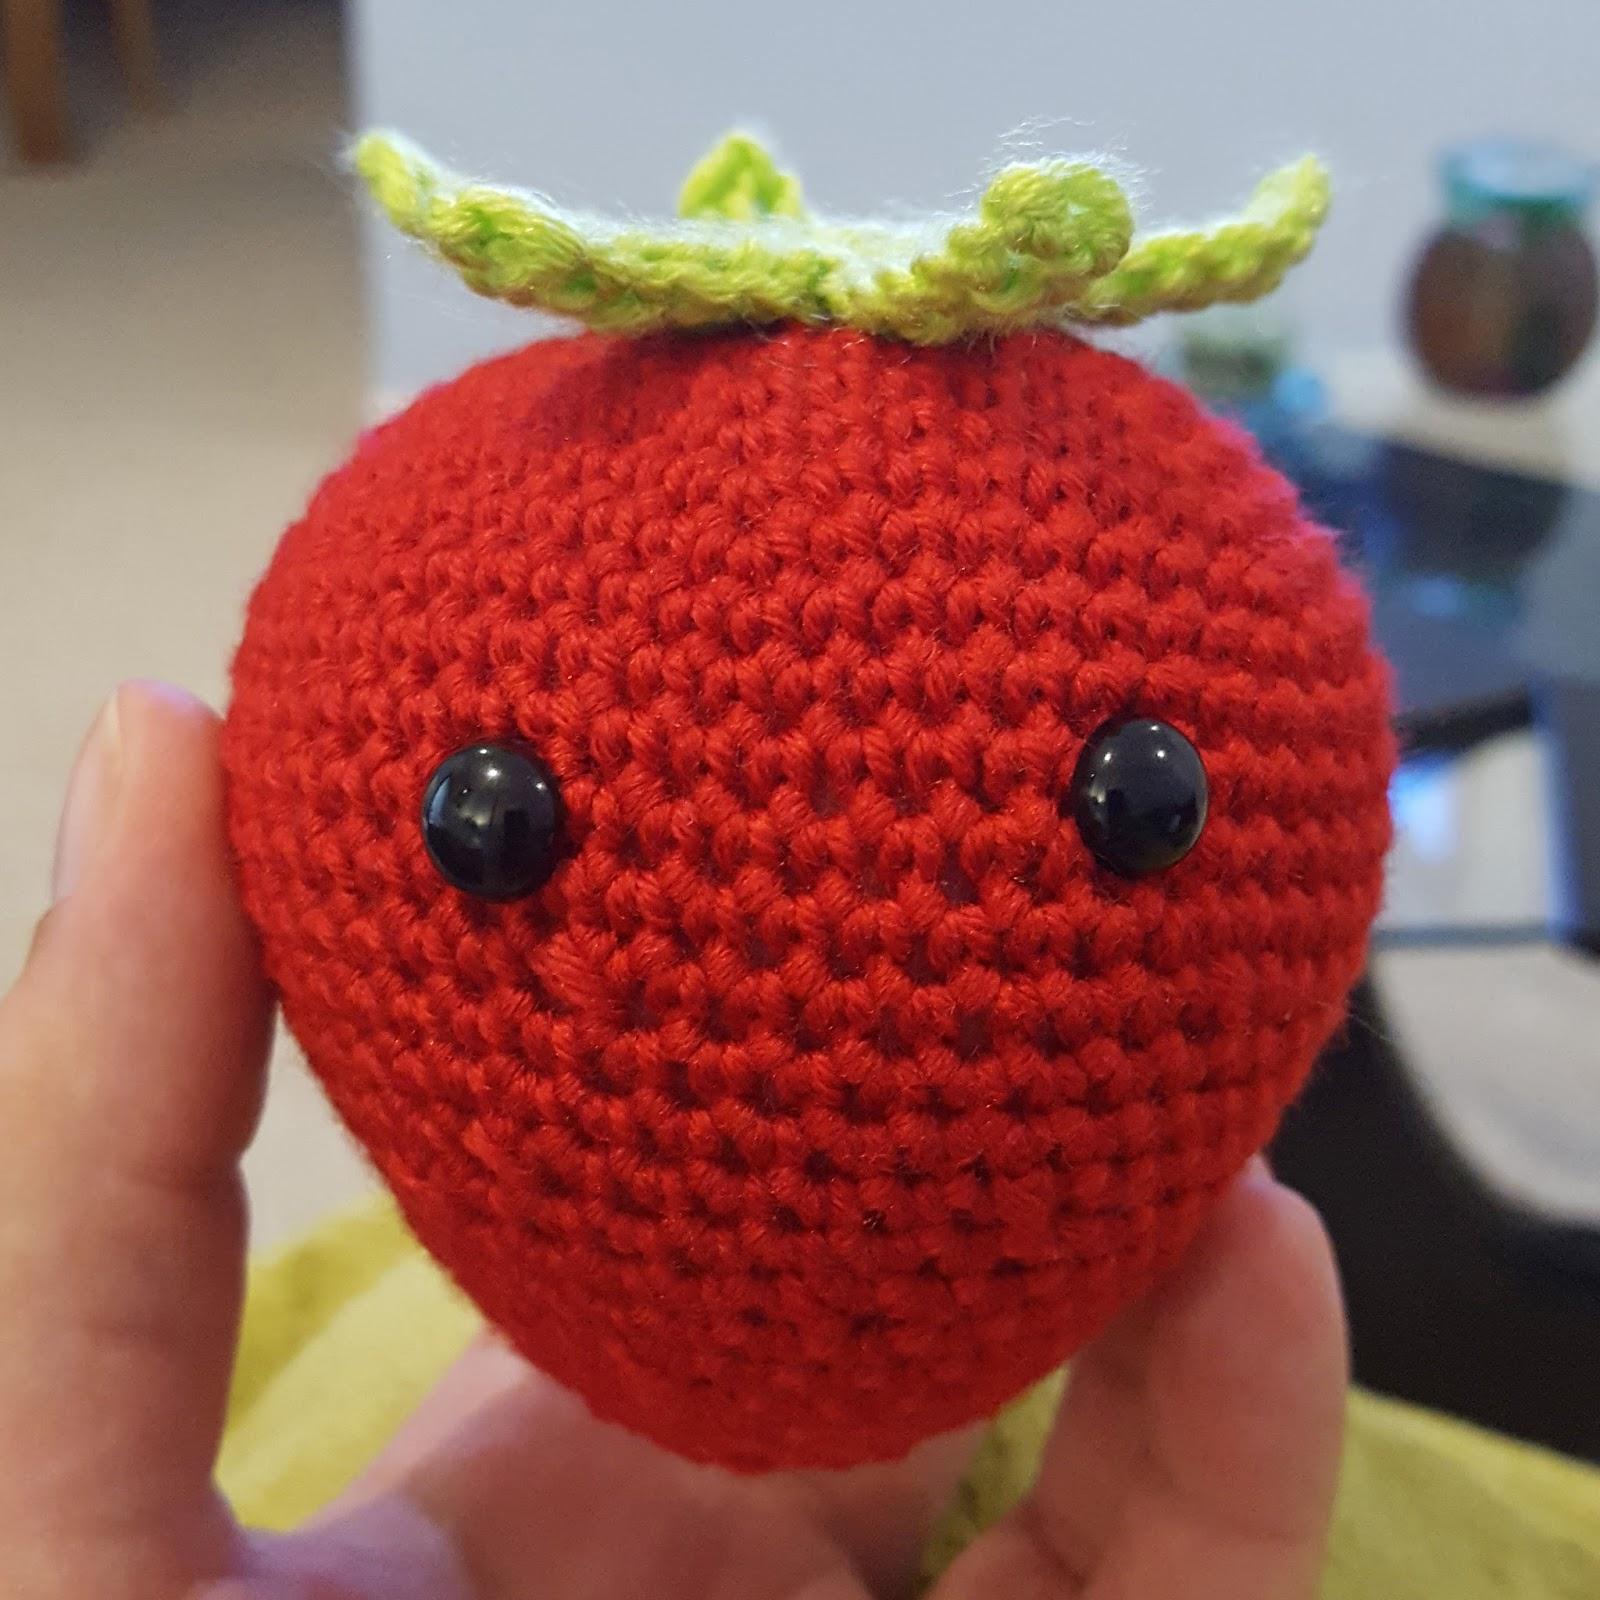 Amigurumi Fruit : Crochet Shaz: Amigurumi Fruit & Veg